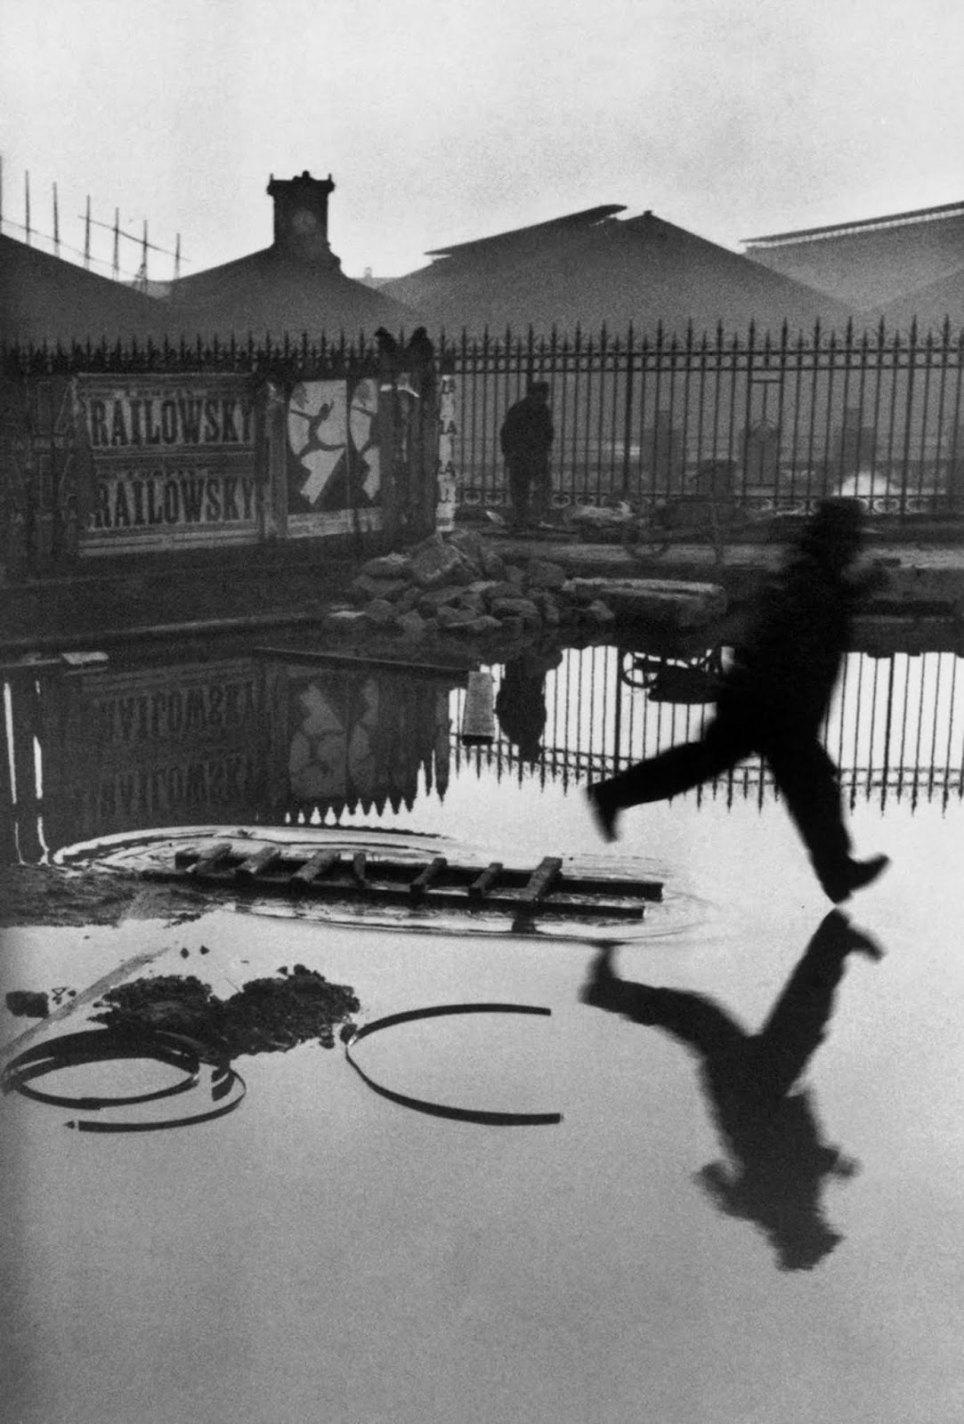 historical photos Behind the Gare Saint-Lazare, Henri Cartier-Bresson, 1932